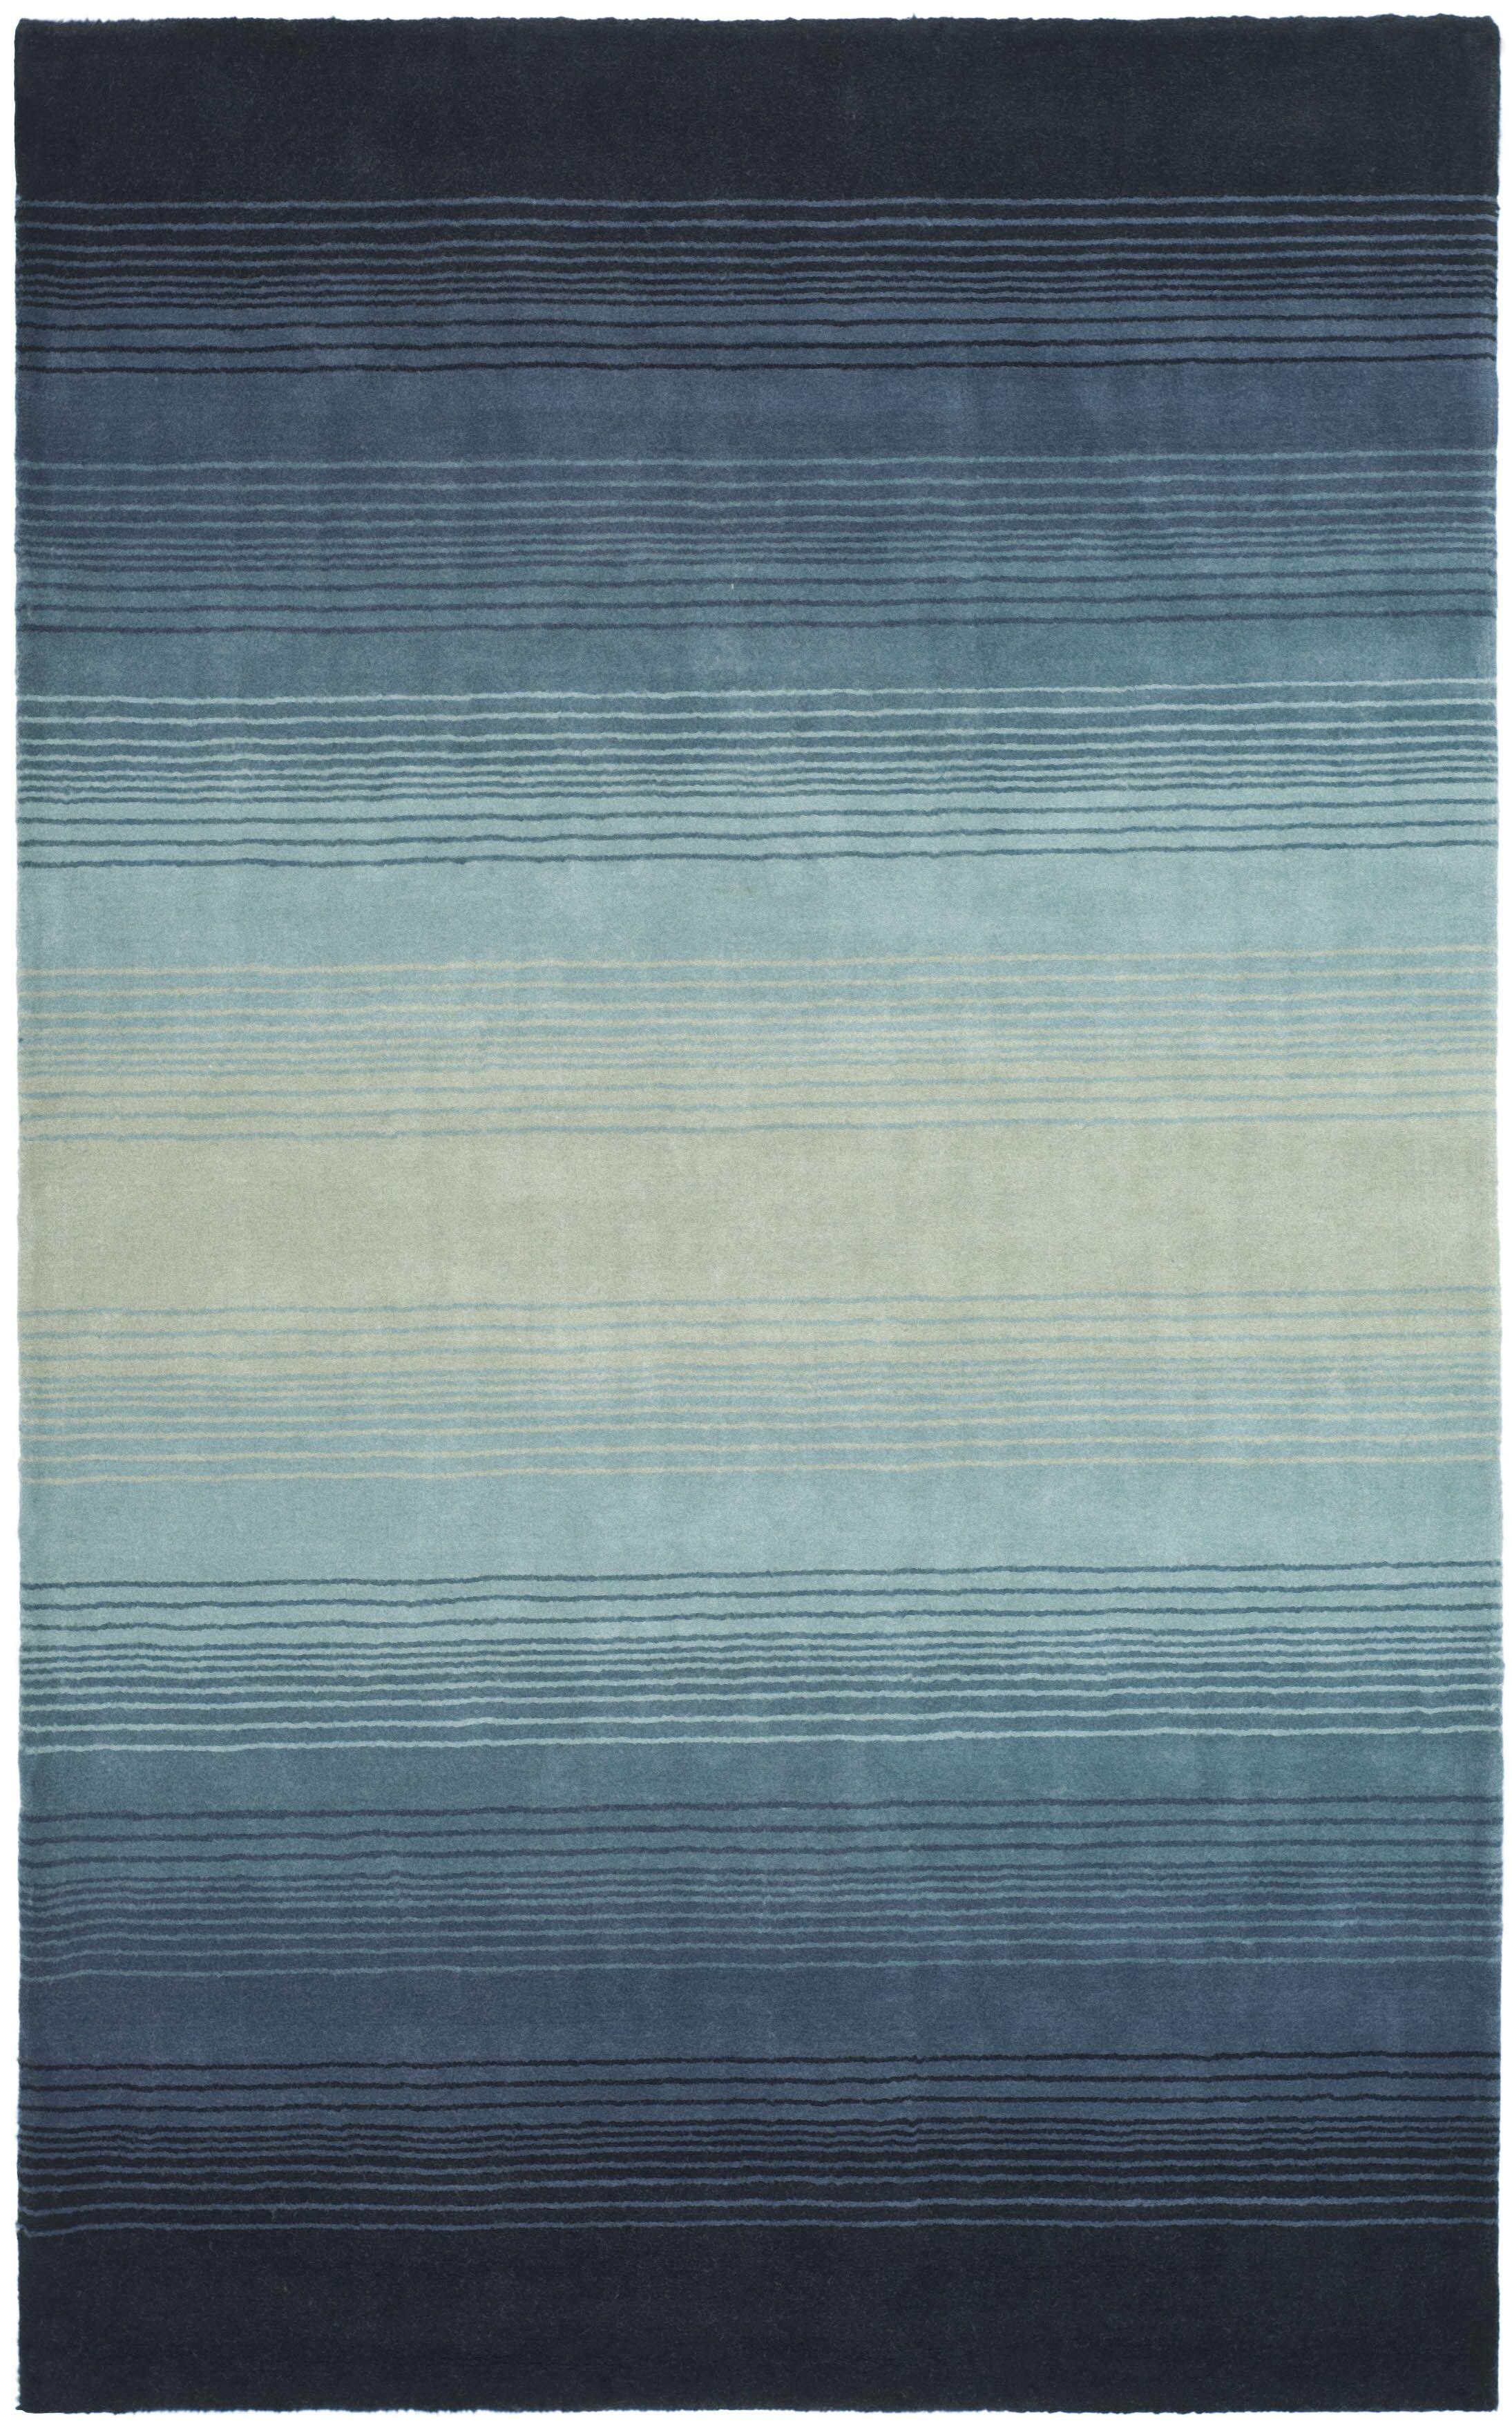 Mcneil Blue Area Rug Rug Size: Rectangle 8' x 10'